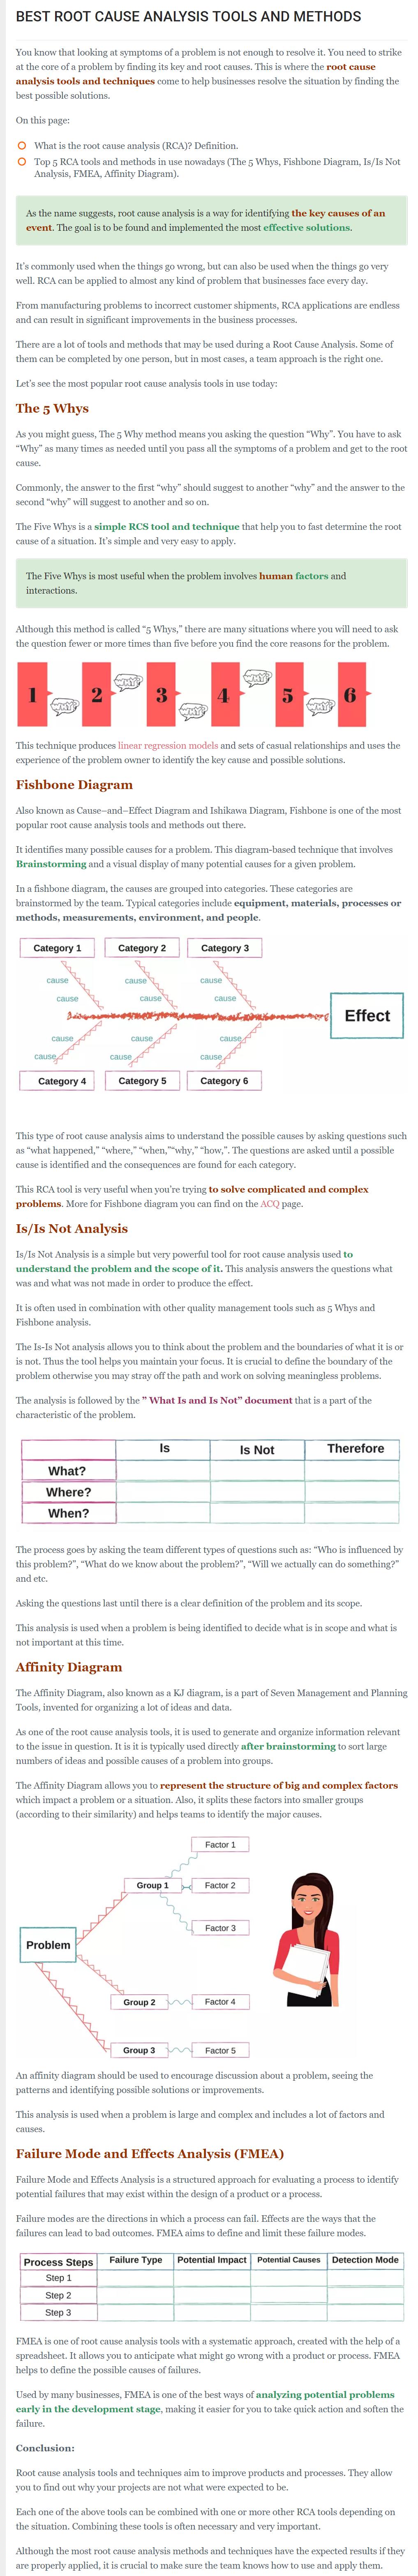 root cause analysis tools